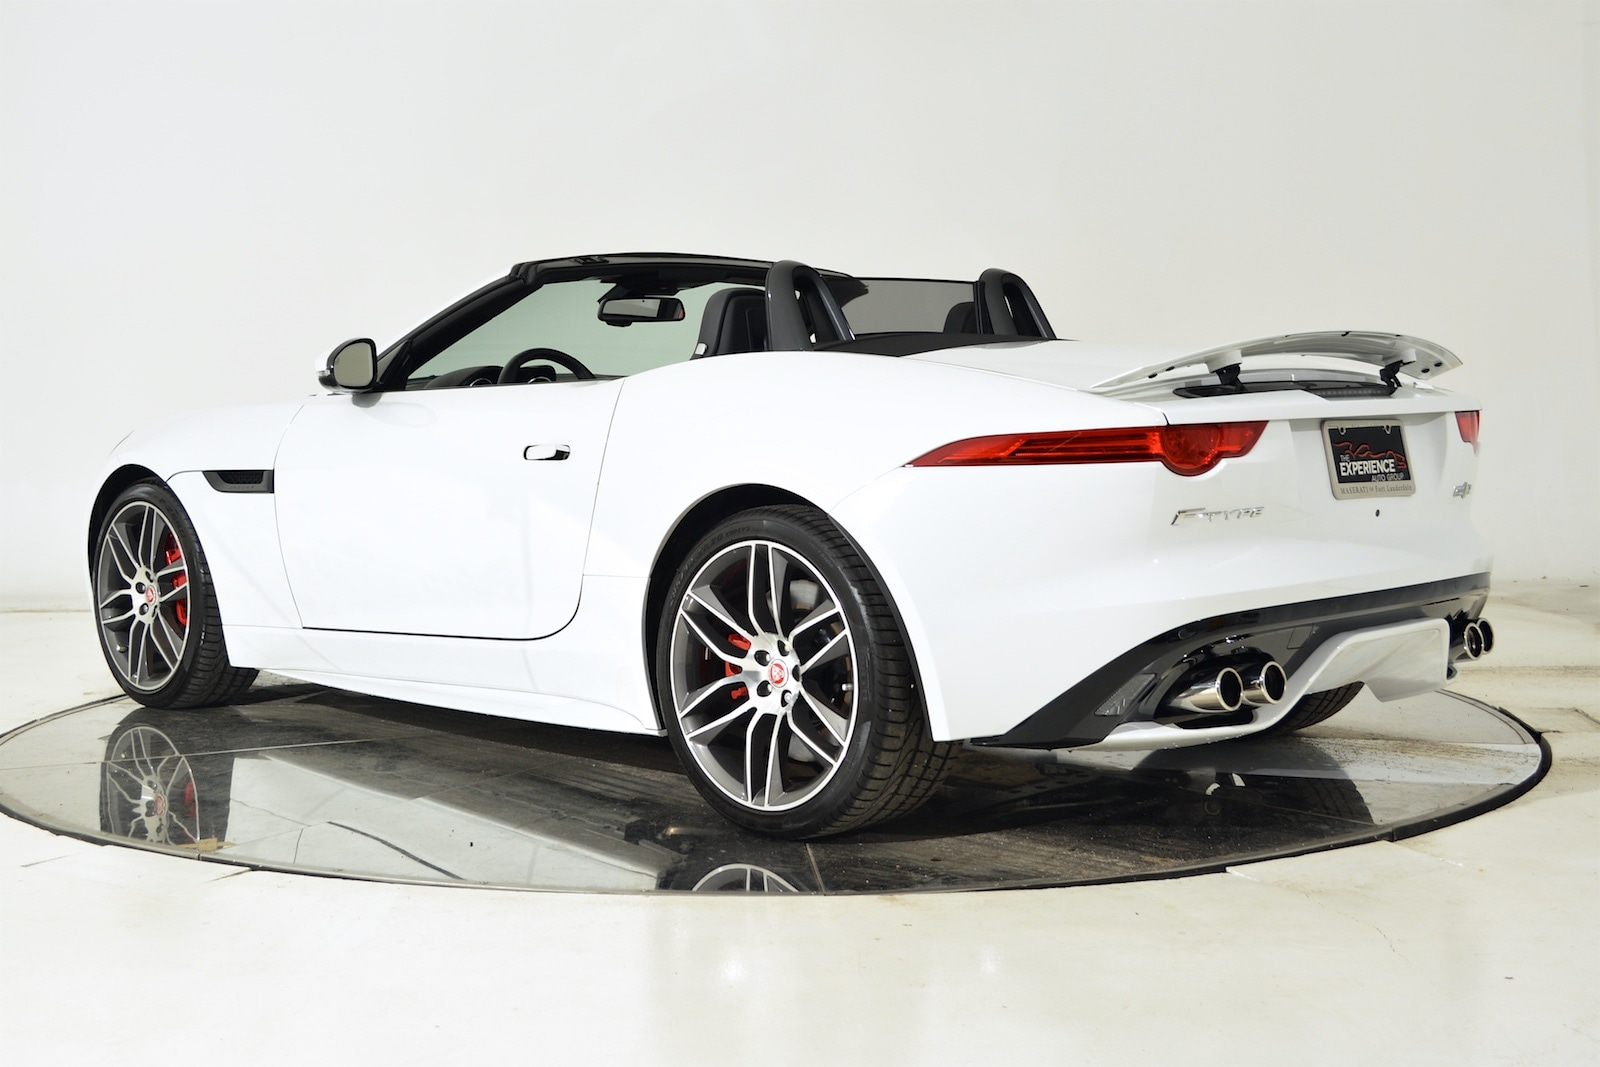 used 2016 jaguar f type r convertible in white for sale ferrari of fort lauderdale. Black Bedroom Furniture Sets. Home Design Ideas